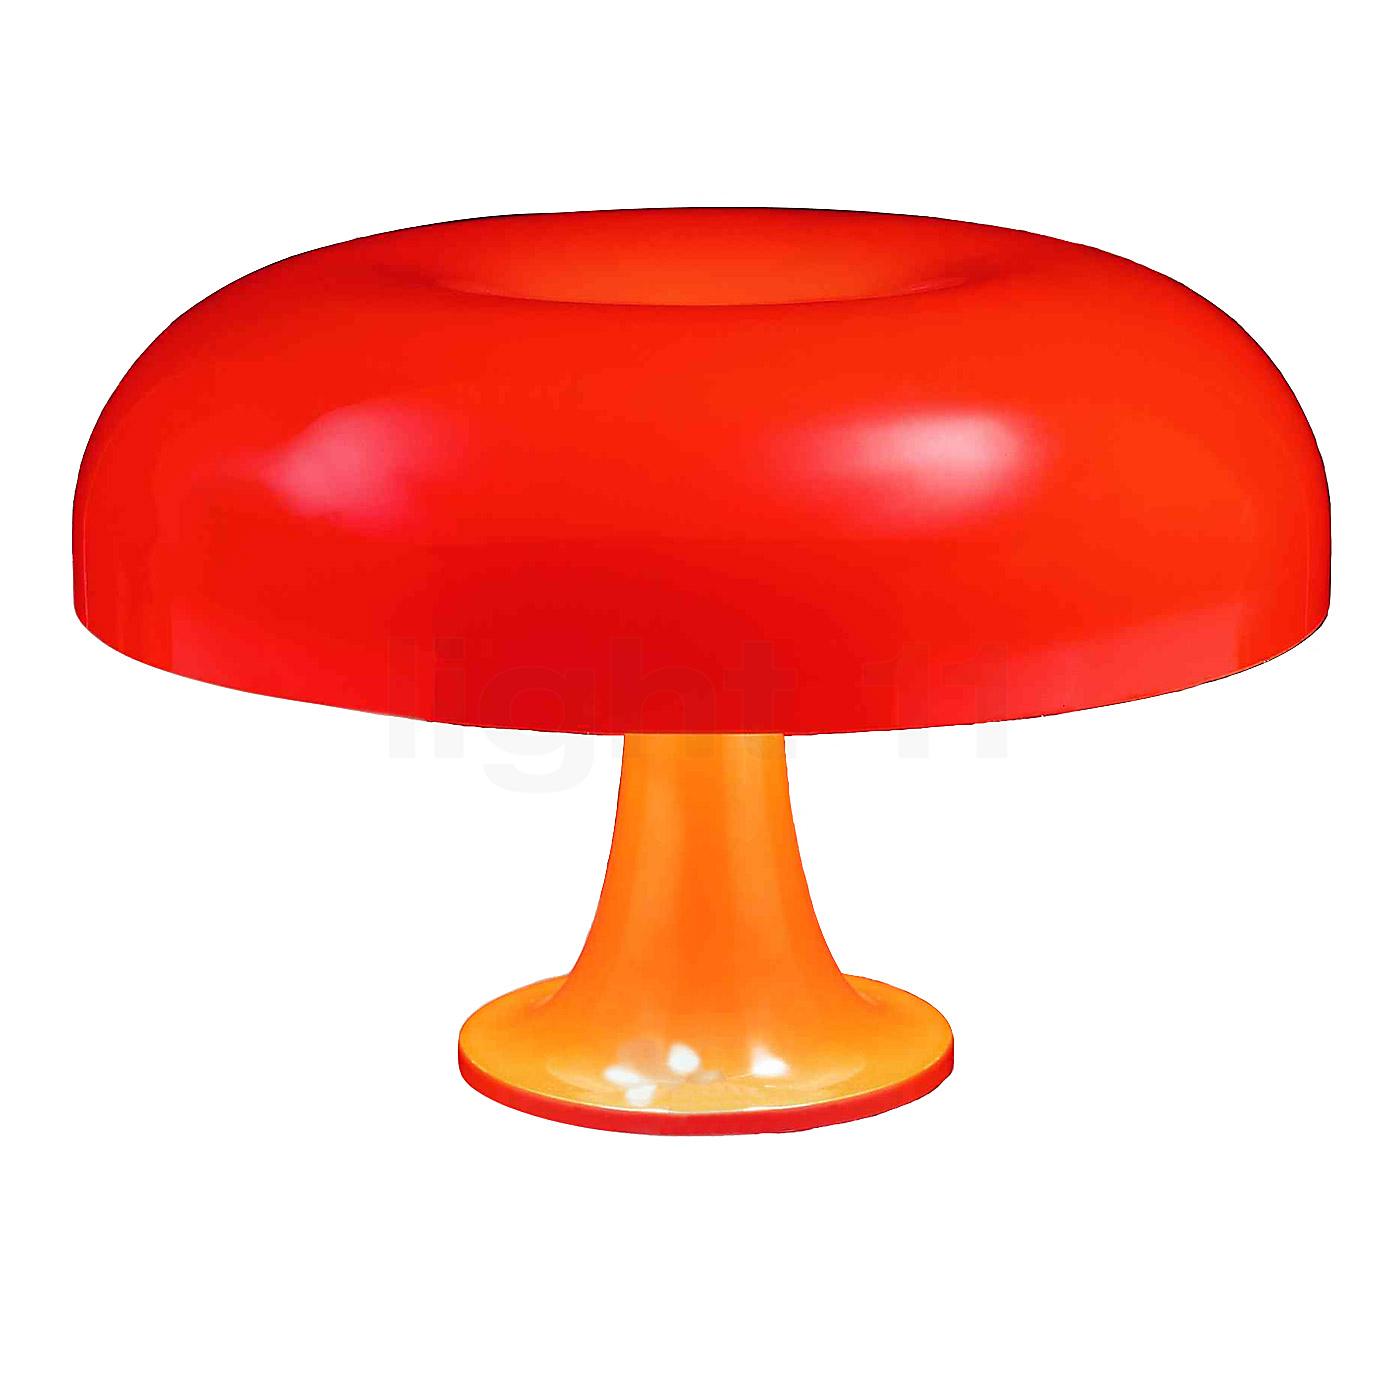 artemide nesso lampe de table en vente sur. Black Bedroom Furniture Sets. Home Design Ideas